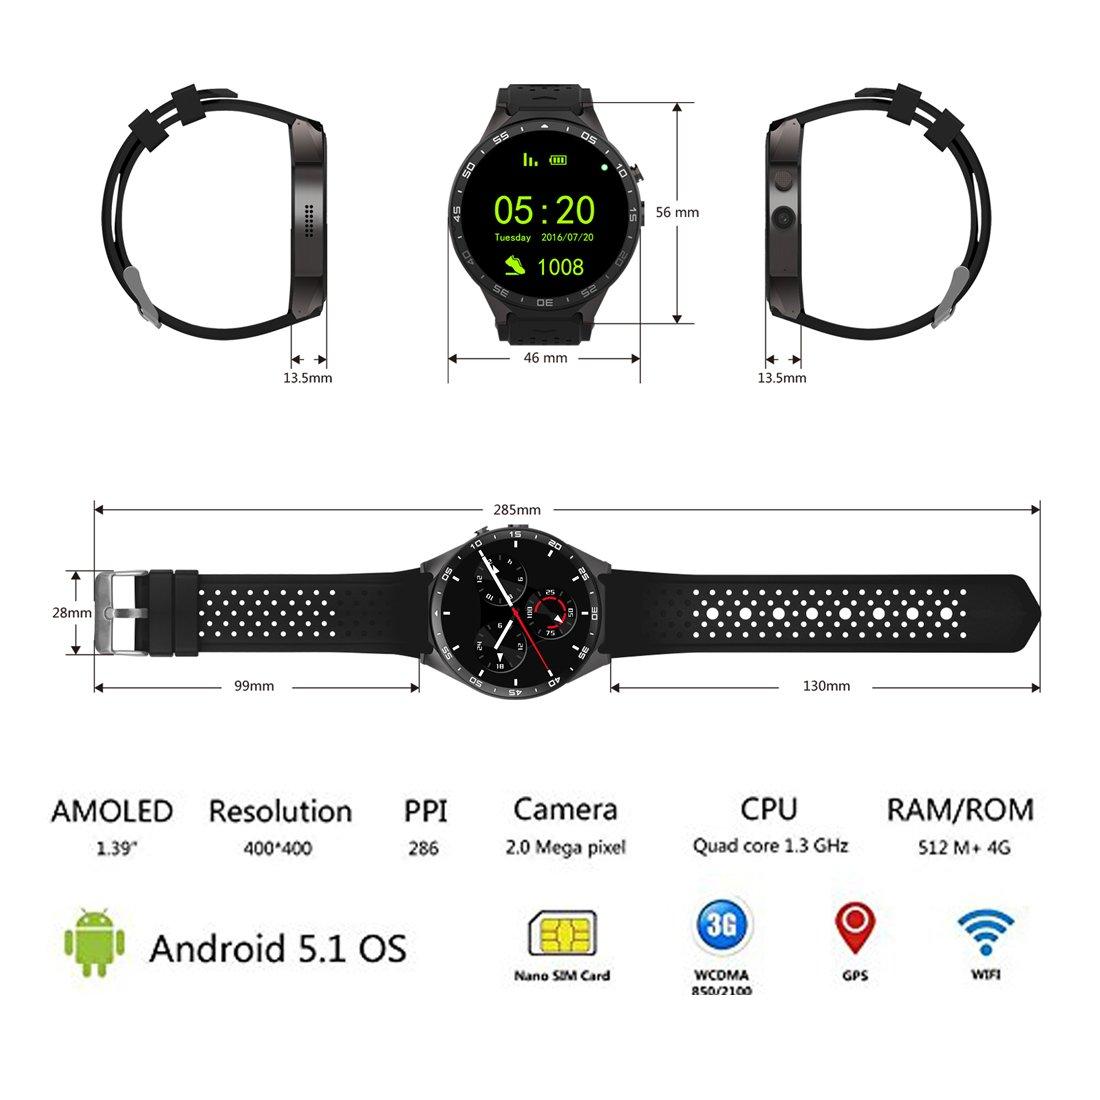 3G Smart Watch, Android 5.1 OS, Quad Core 2.0MP Camera Bluetooth Nano SIM Card Soket WiFi GPS Heart Rate Monitor (Black+Silver)